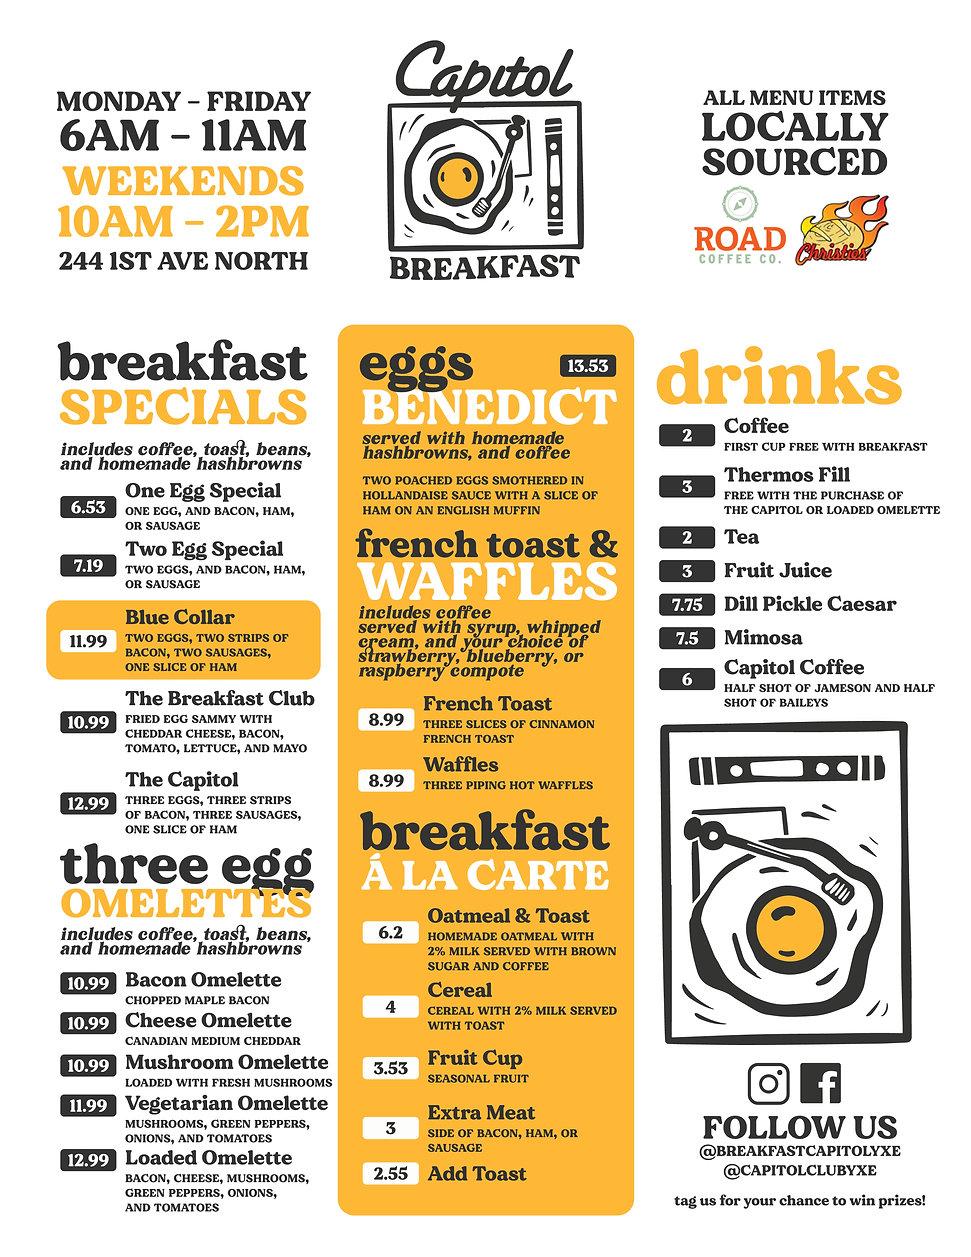 BreakfastCapitolMenuSpring2021.jpg